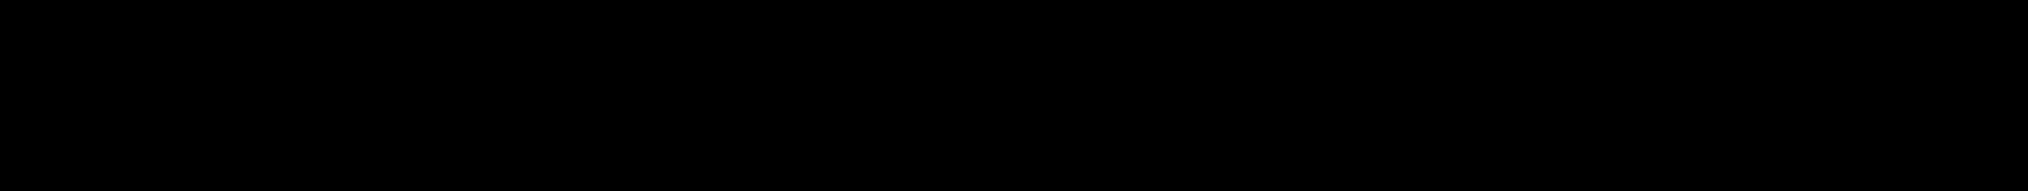 Sofachrome ExtraLight